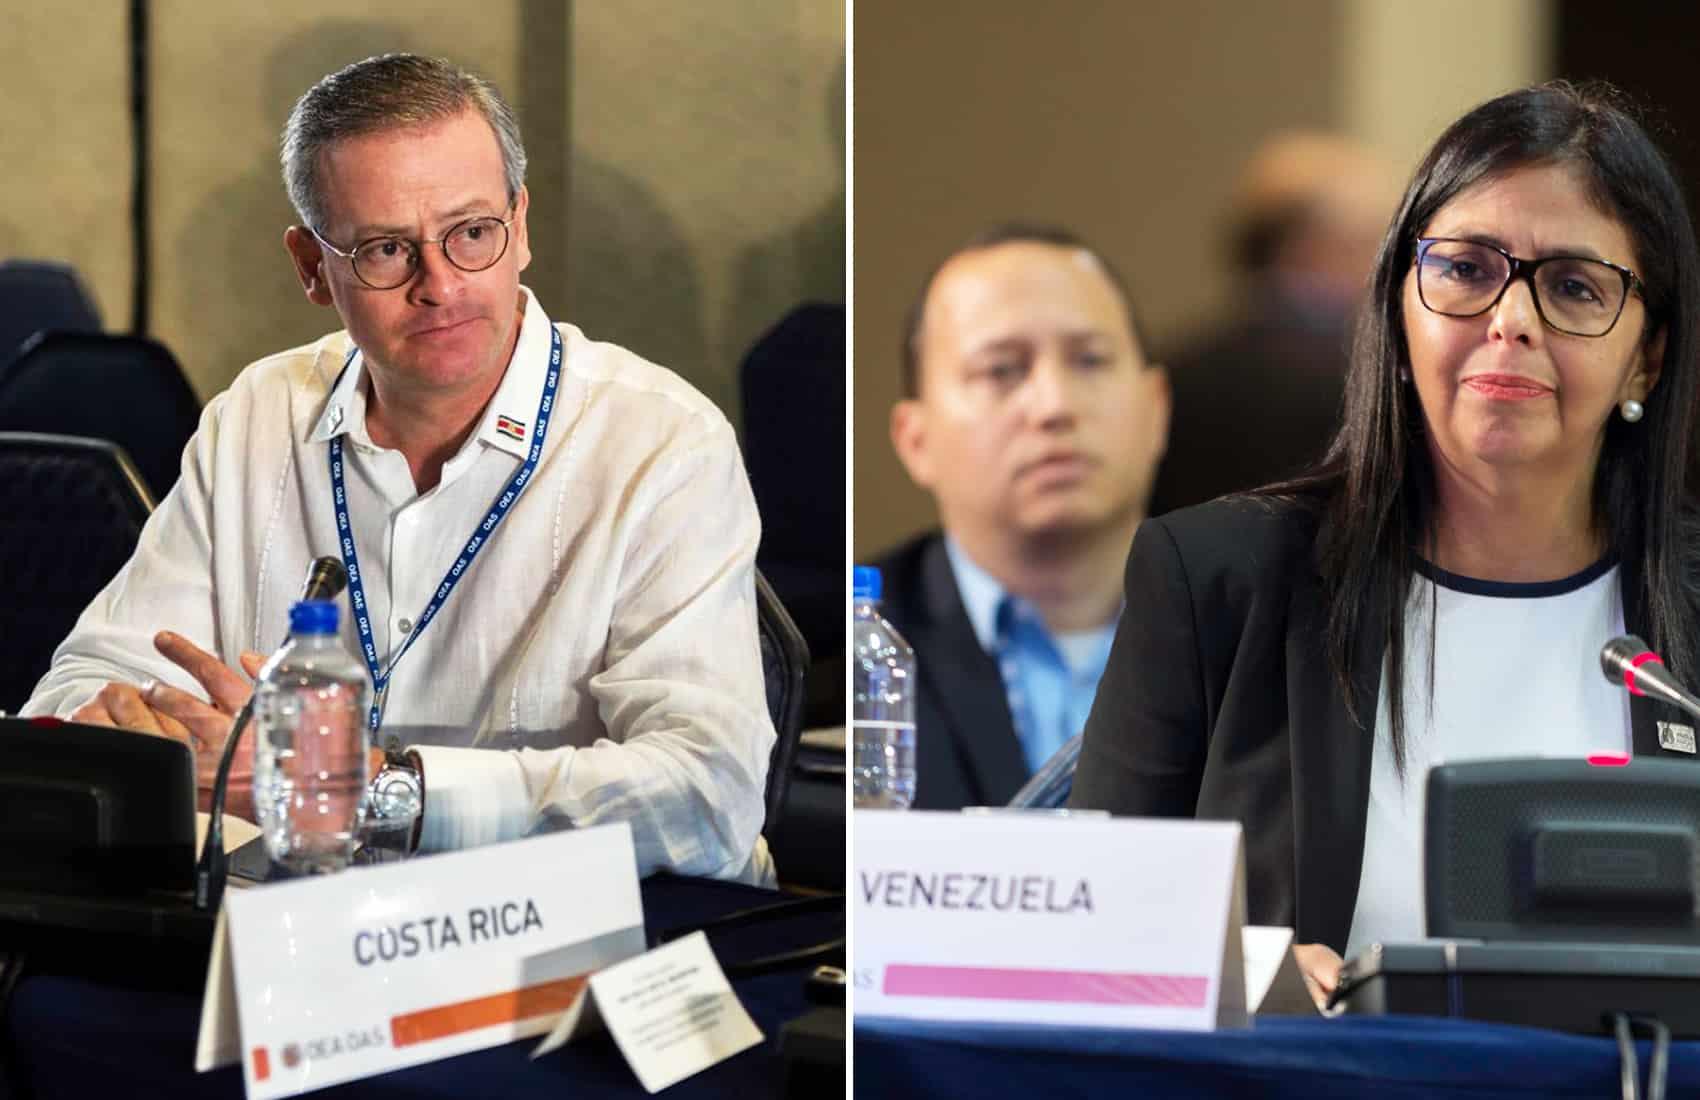 Costa Rica's Foreign Minister Manuel González Sanz, Venezuelan Foreign Affairs Minister Delcy Rodríguez Gómez. OAS Assembly, June 19, 2017.